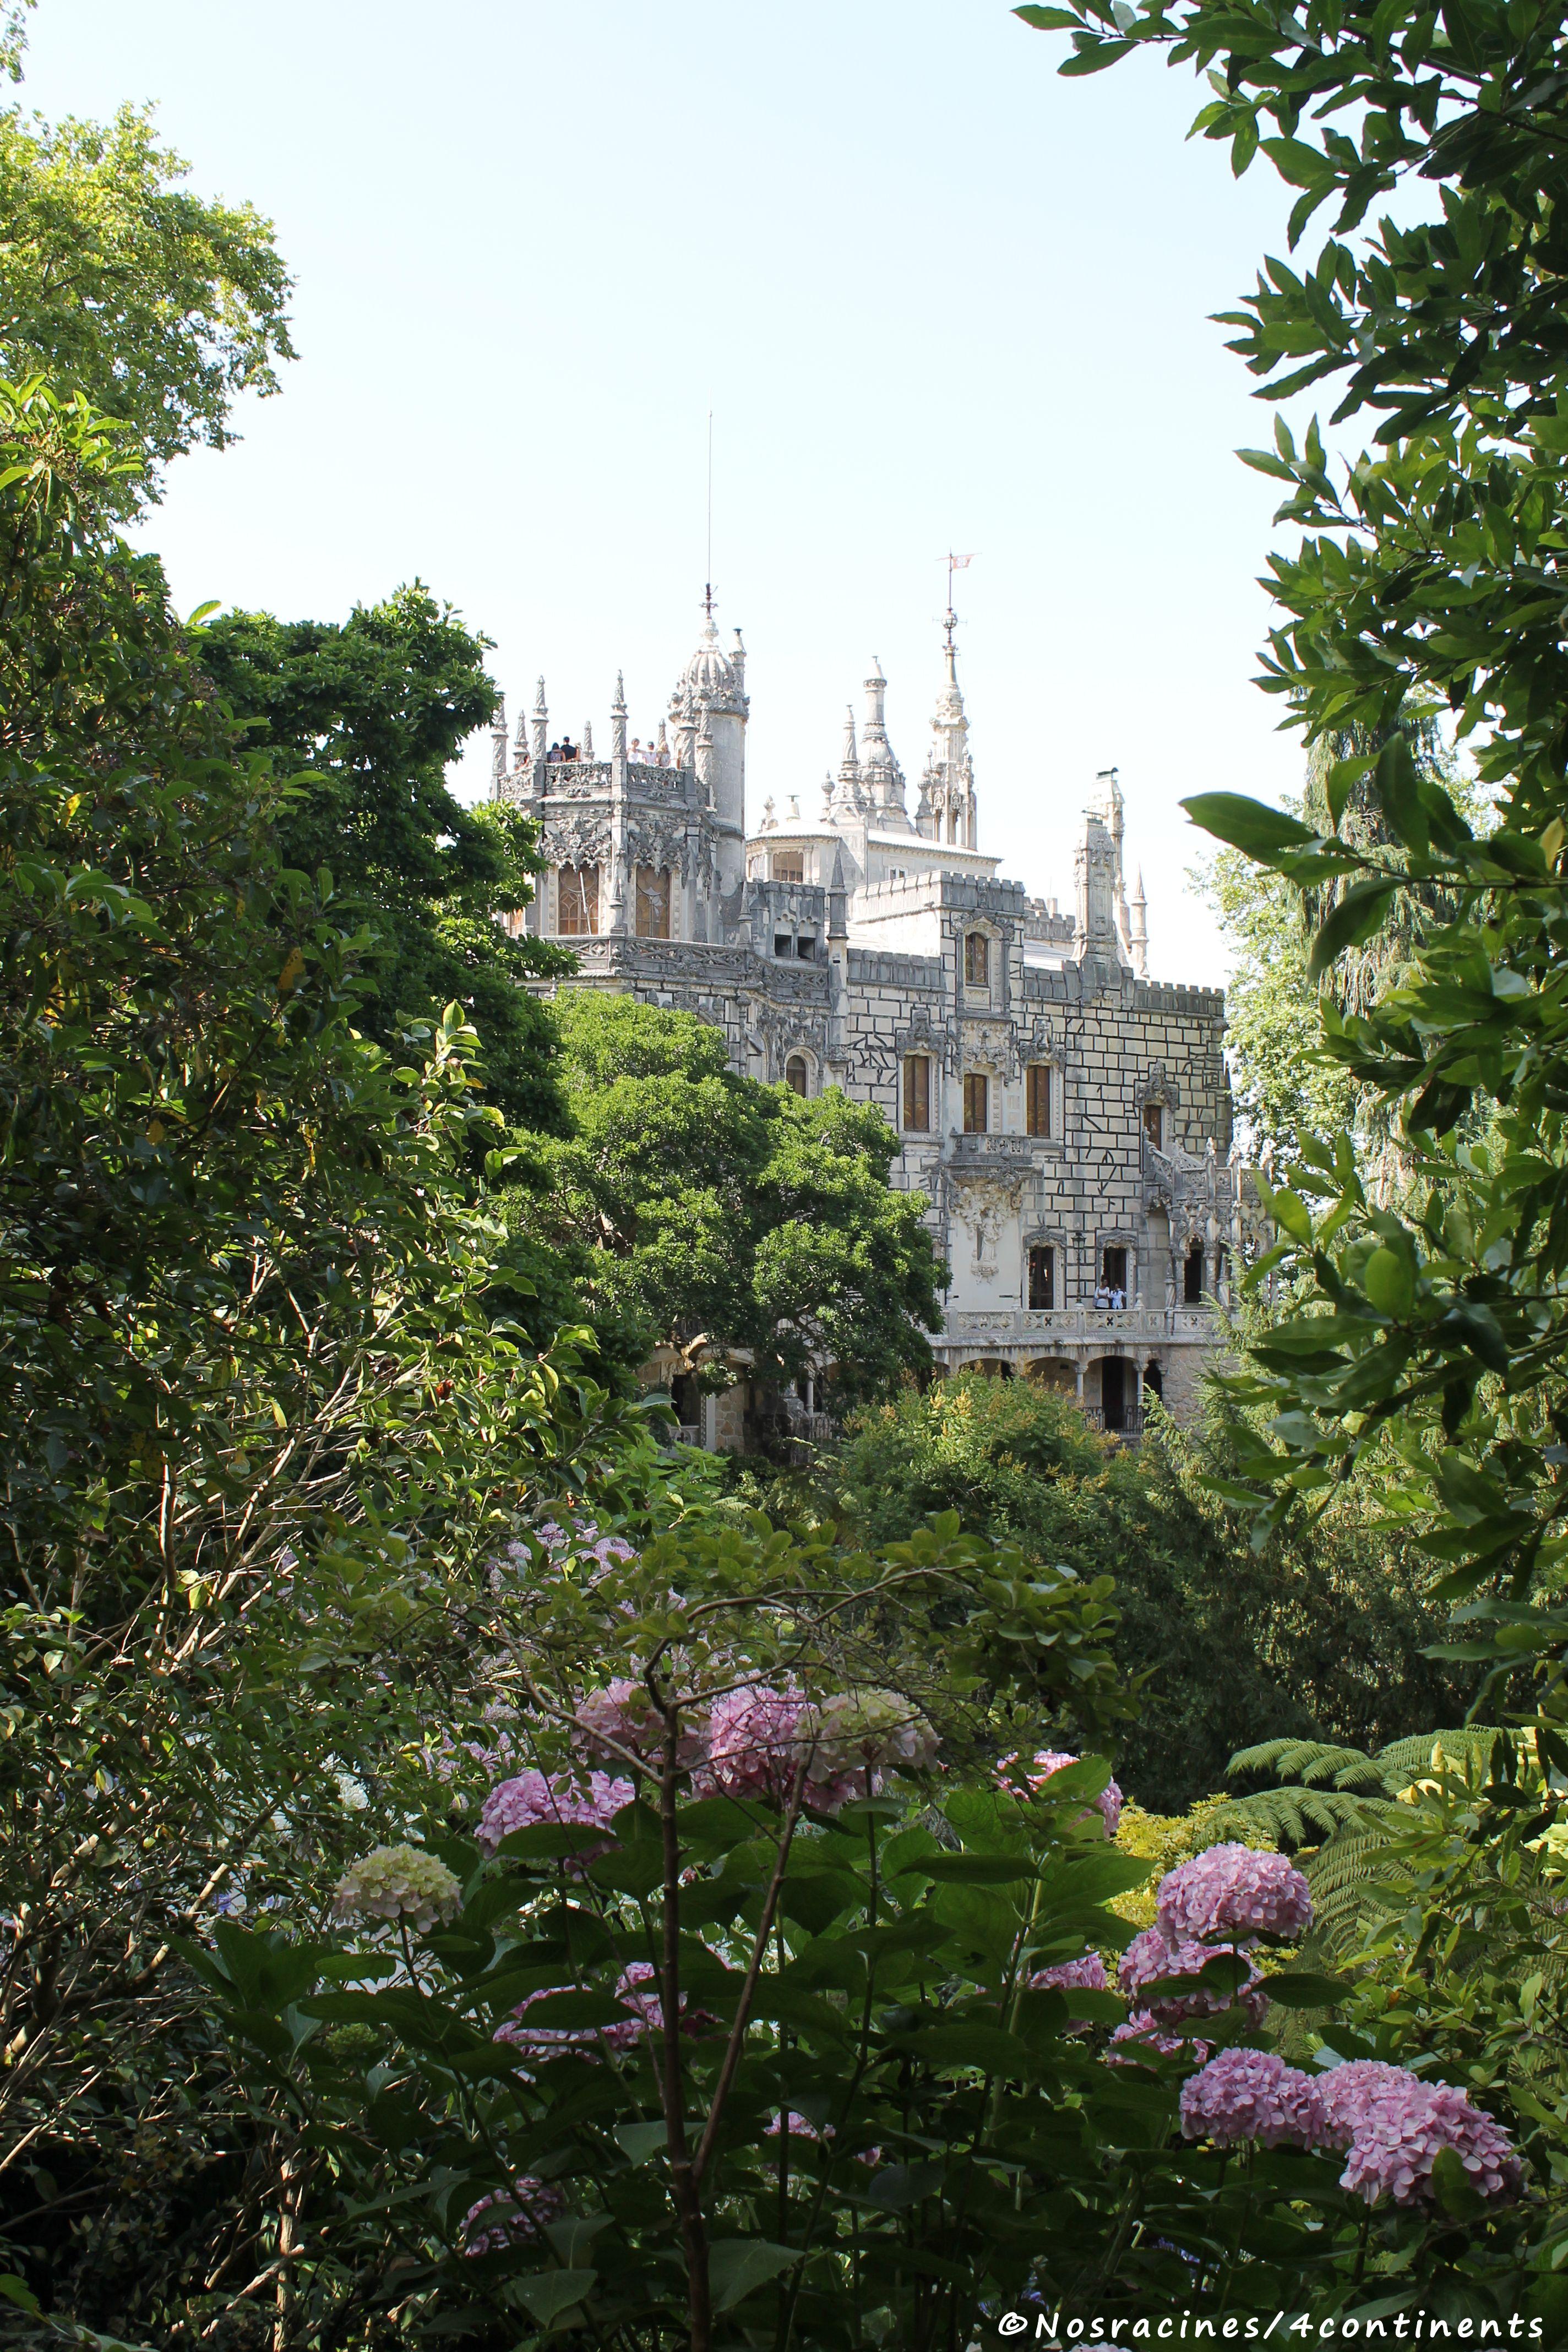 Quinta da regaleira un lieu magique et myst rieux nos for Jardines quinta da regaleira